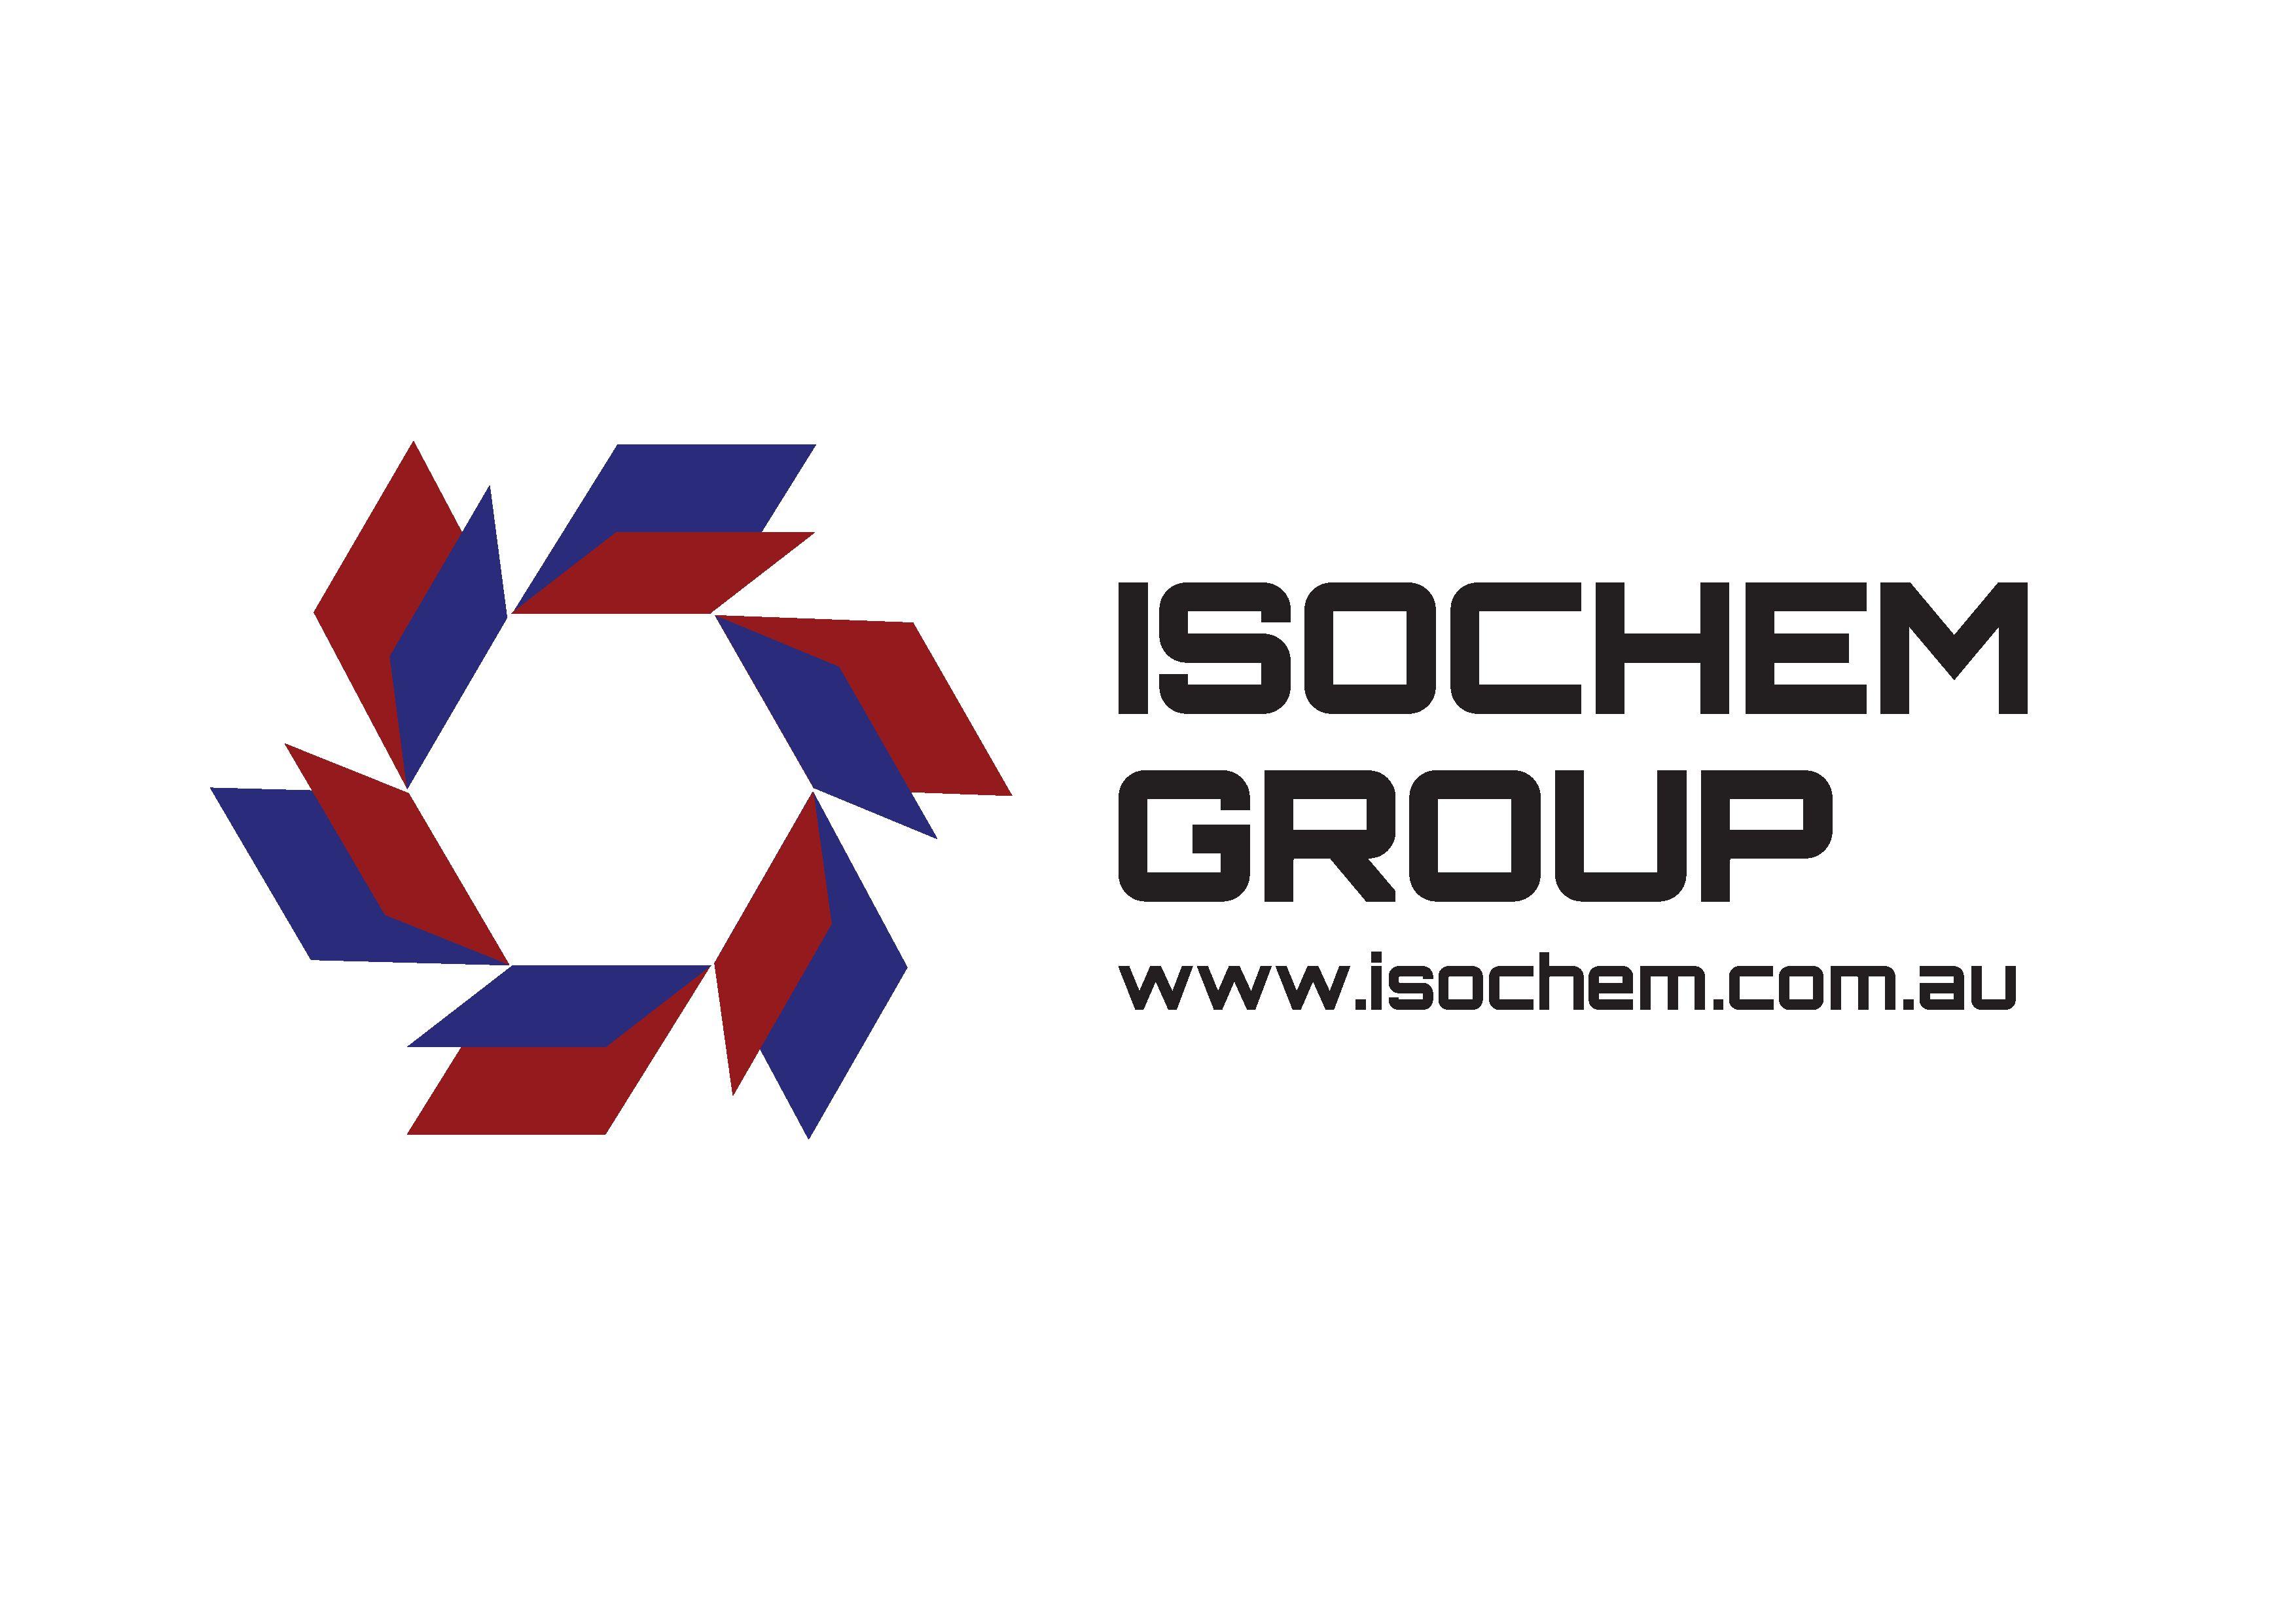 Isochem Group